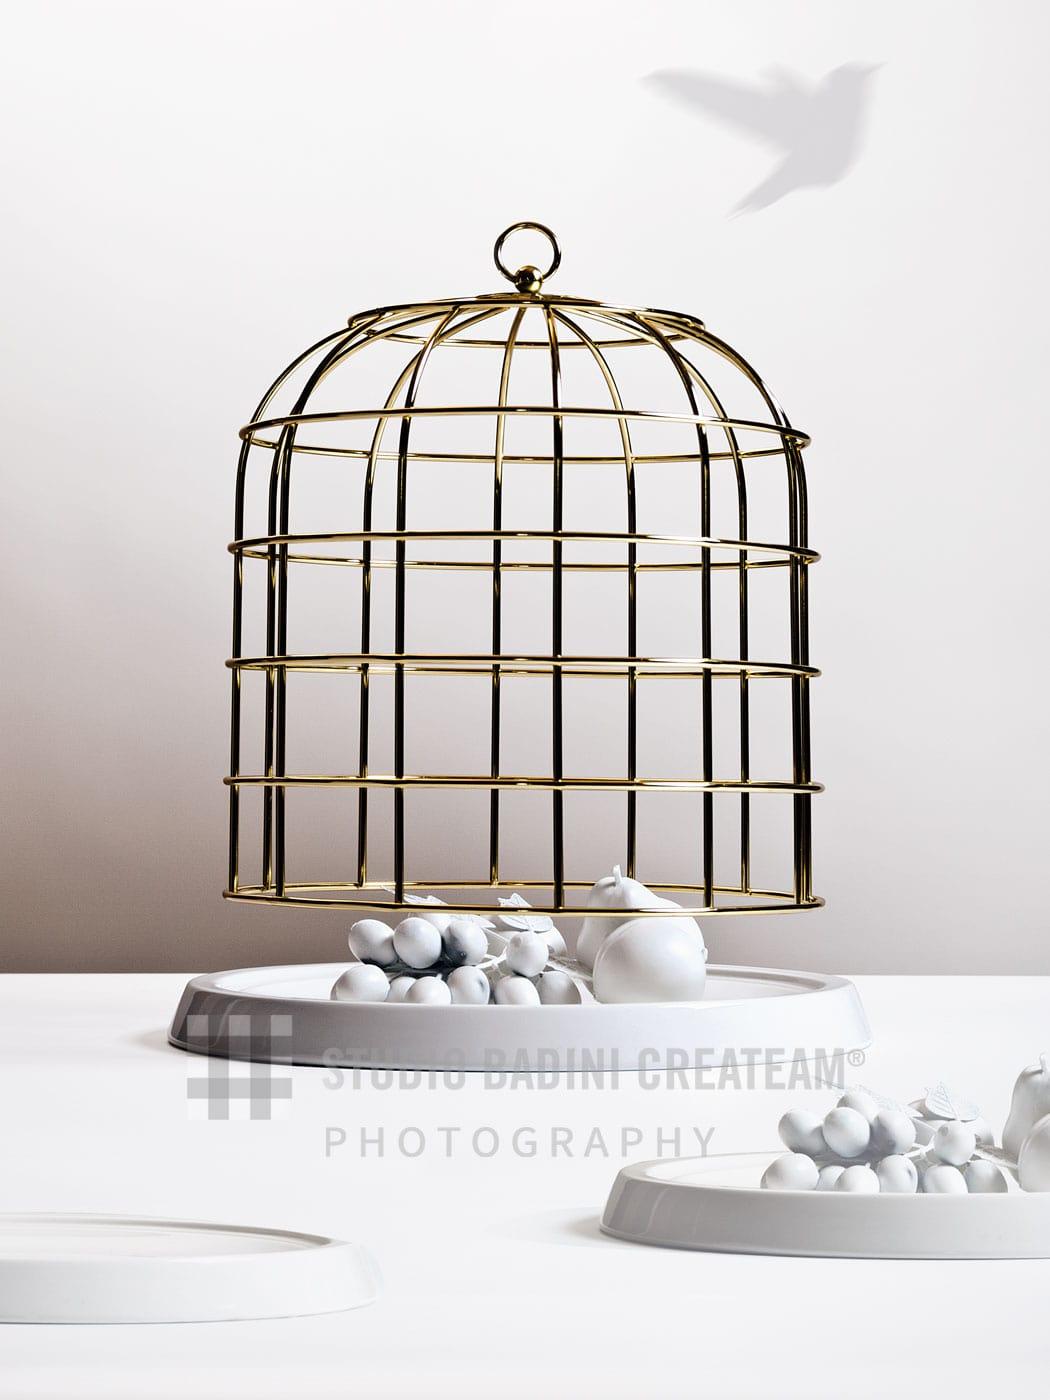 Badini Creative Studio - fotografia - seletti - twitable